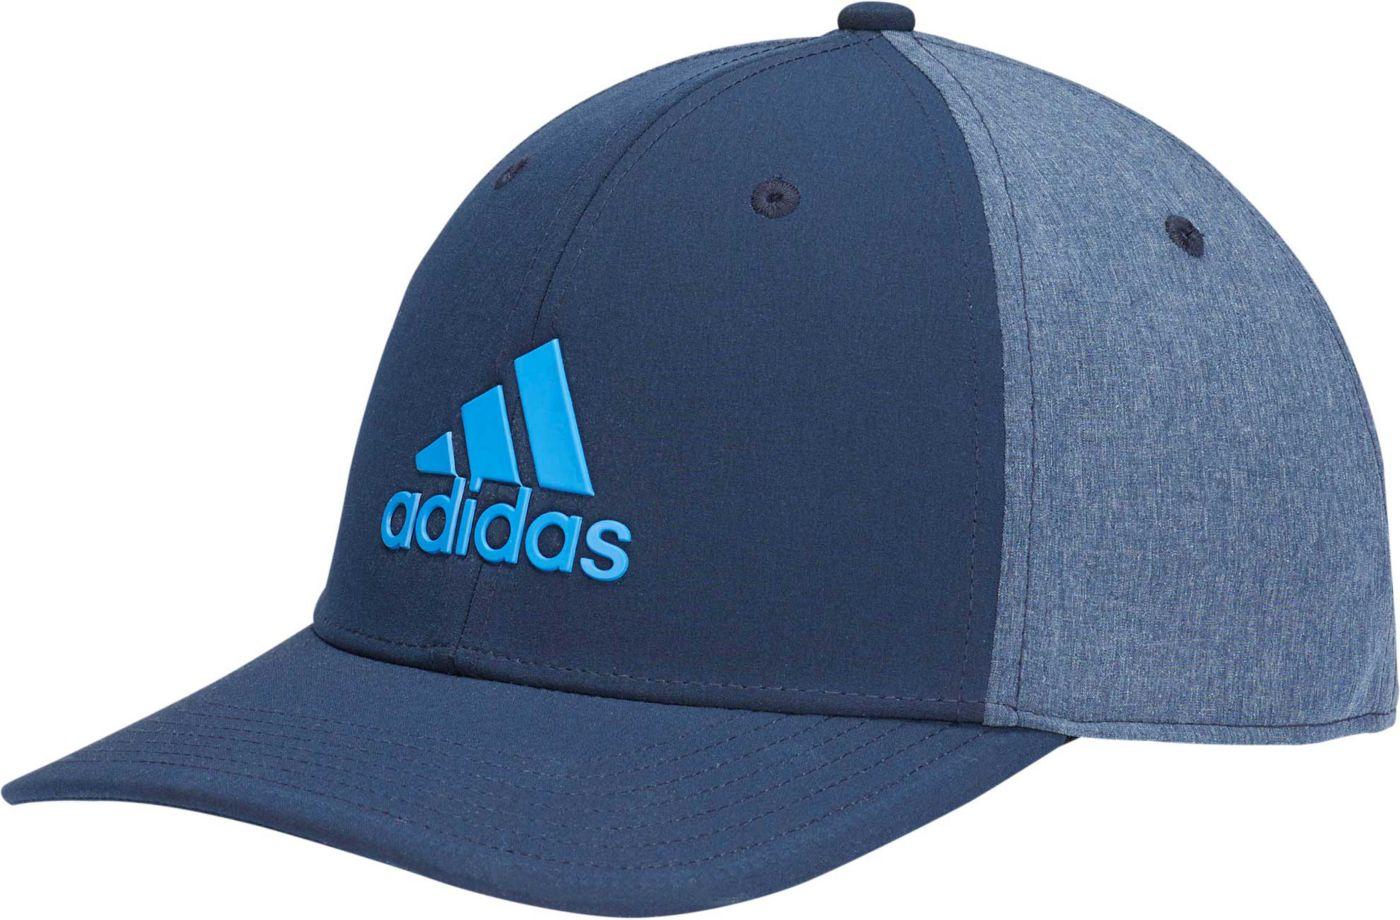 adidas Men's A-Stretch Badge of Sport Tour Heather Golf Hat